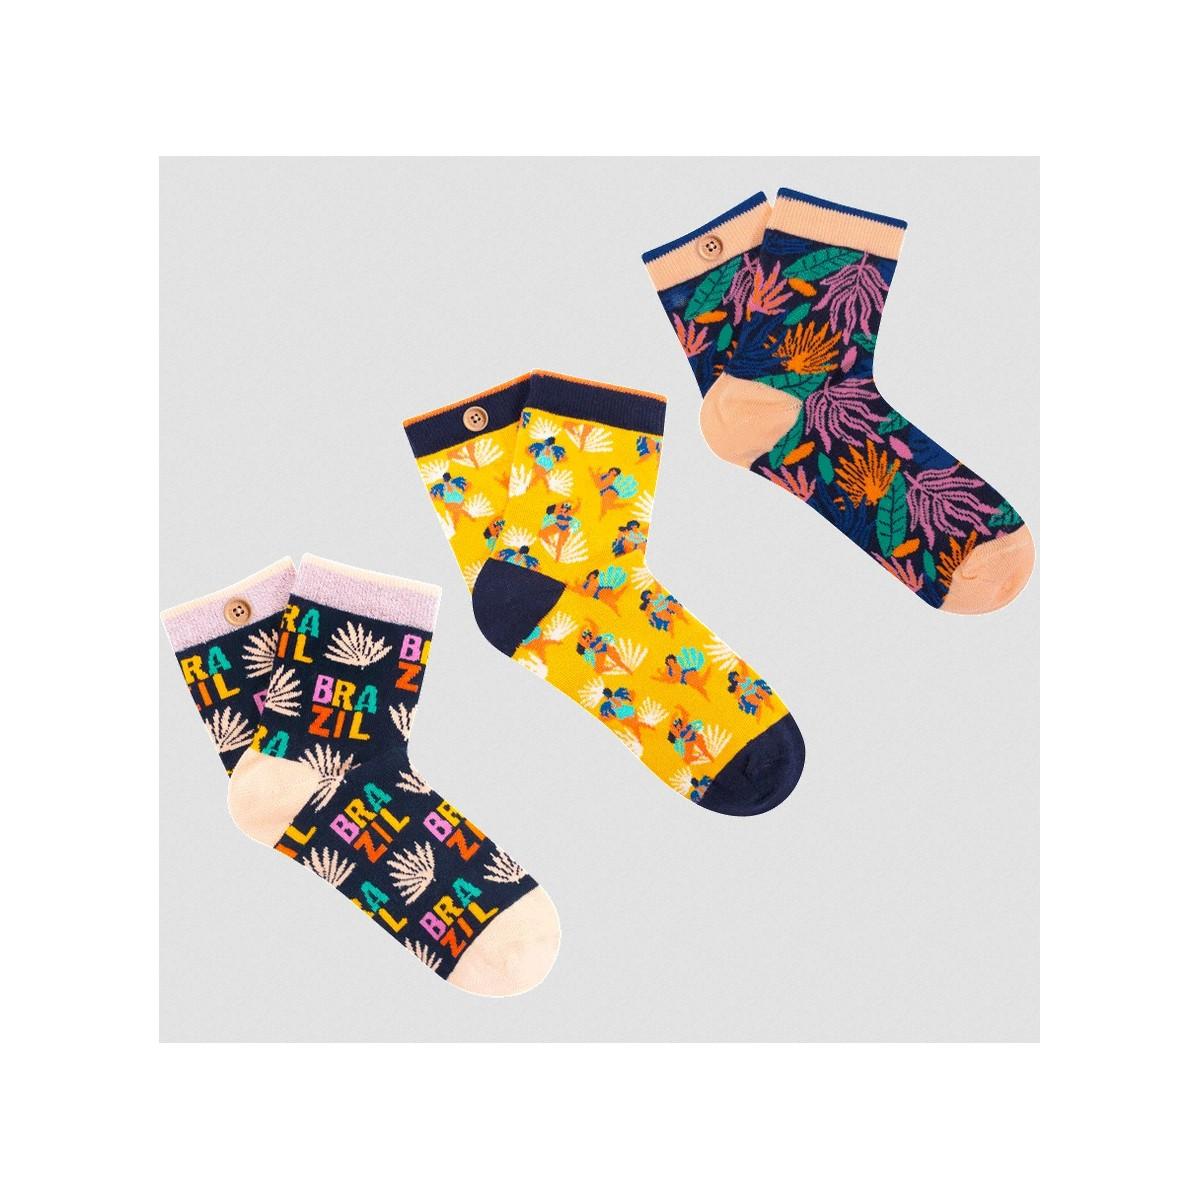 Cabaia - Pack chaussettes Samba de Janeiro